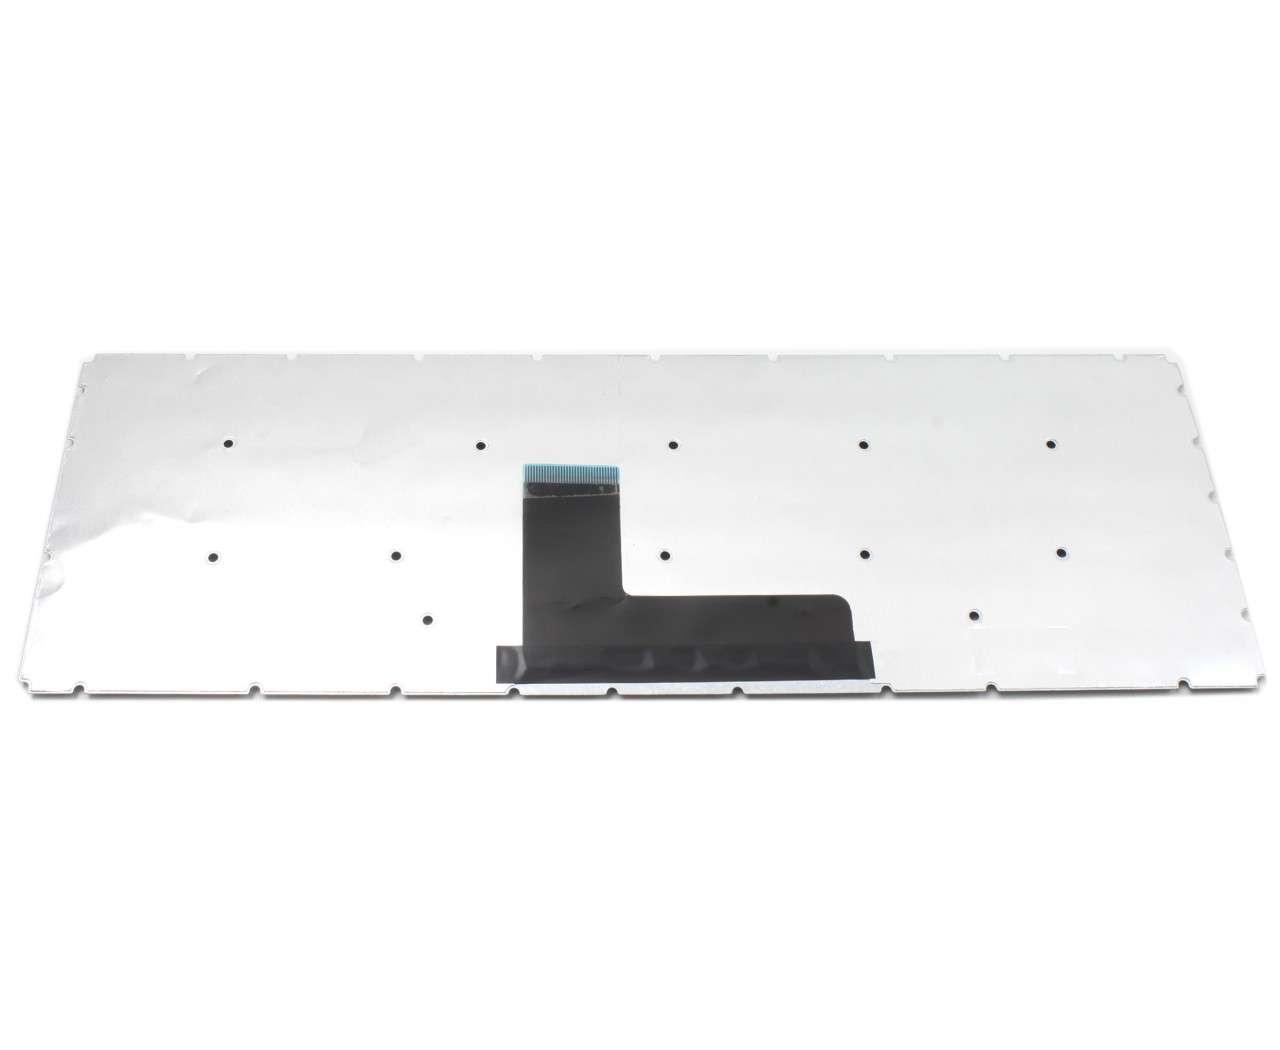 Tastatura Toshiba Satellite C55 C layout US fara rama enter mic imagine powerlaptop.ro 2021